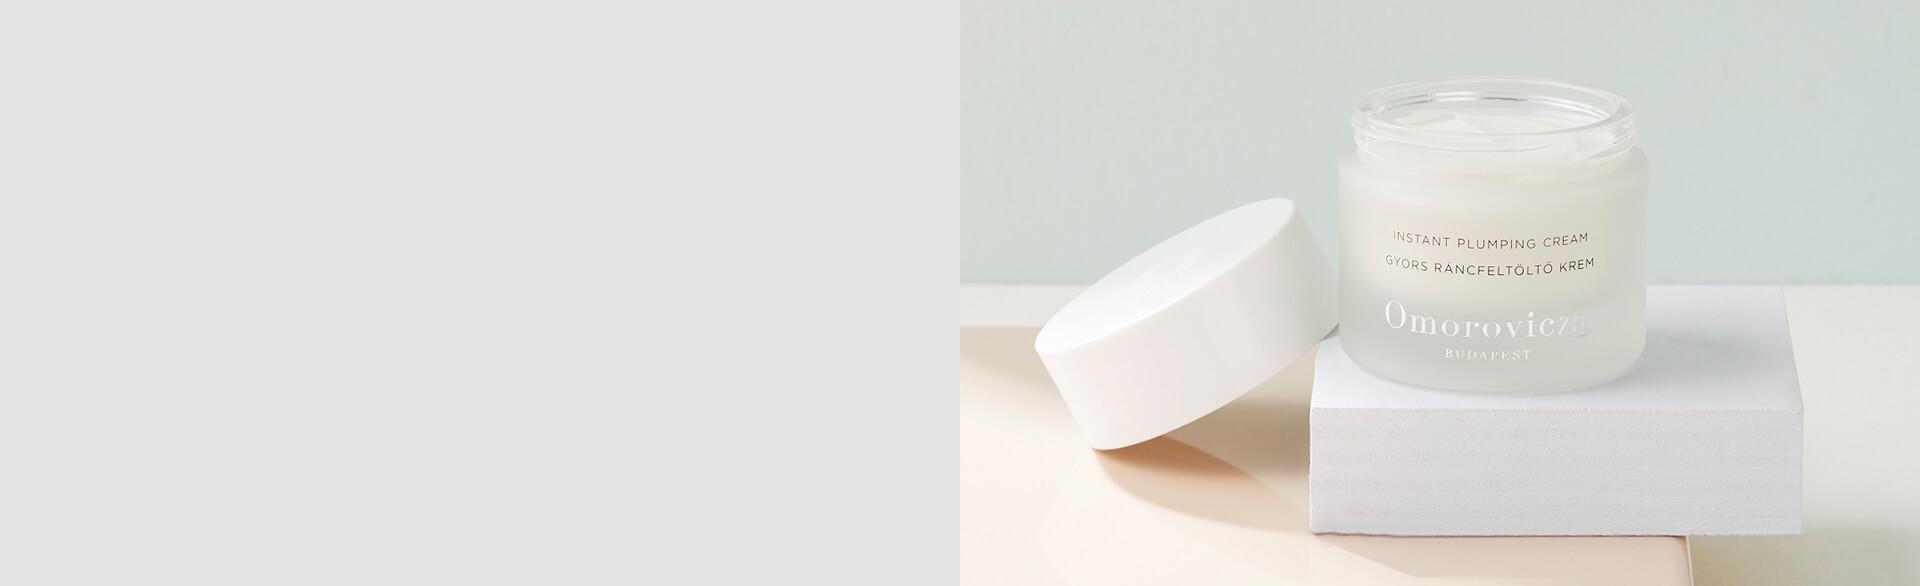 SAVE 5% ON ALL ORDERS - rejuvenating night cream